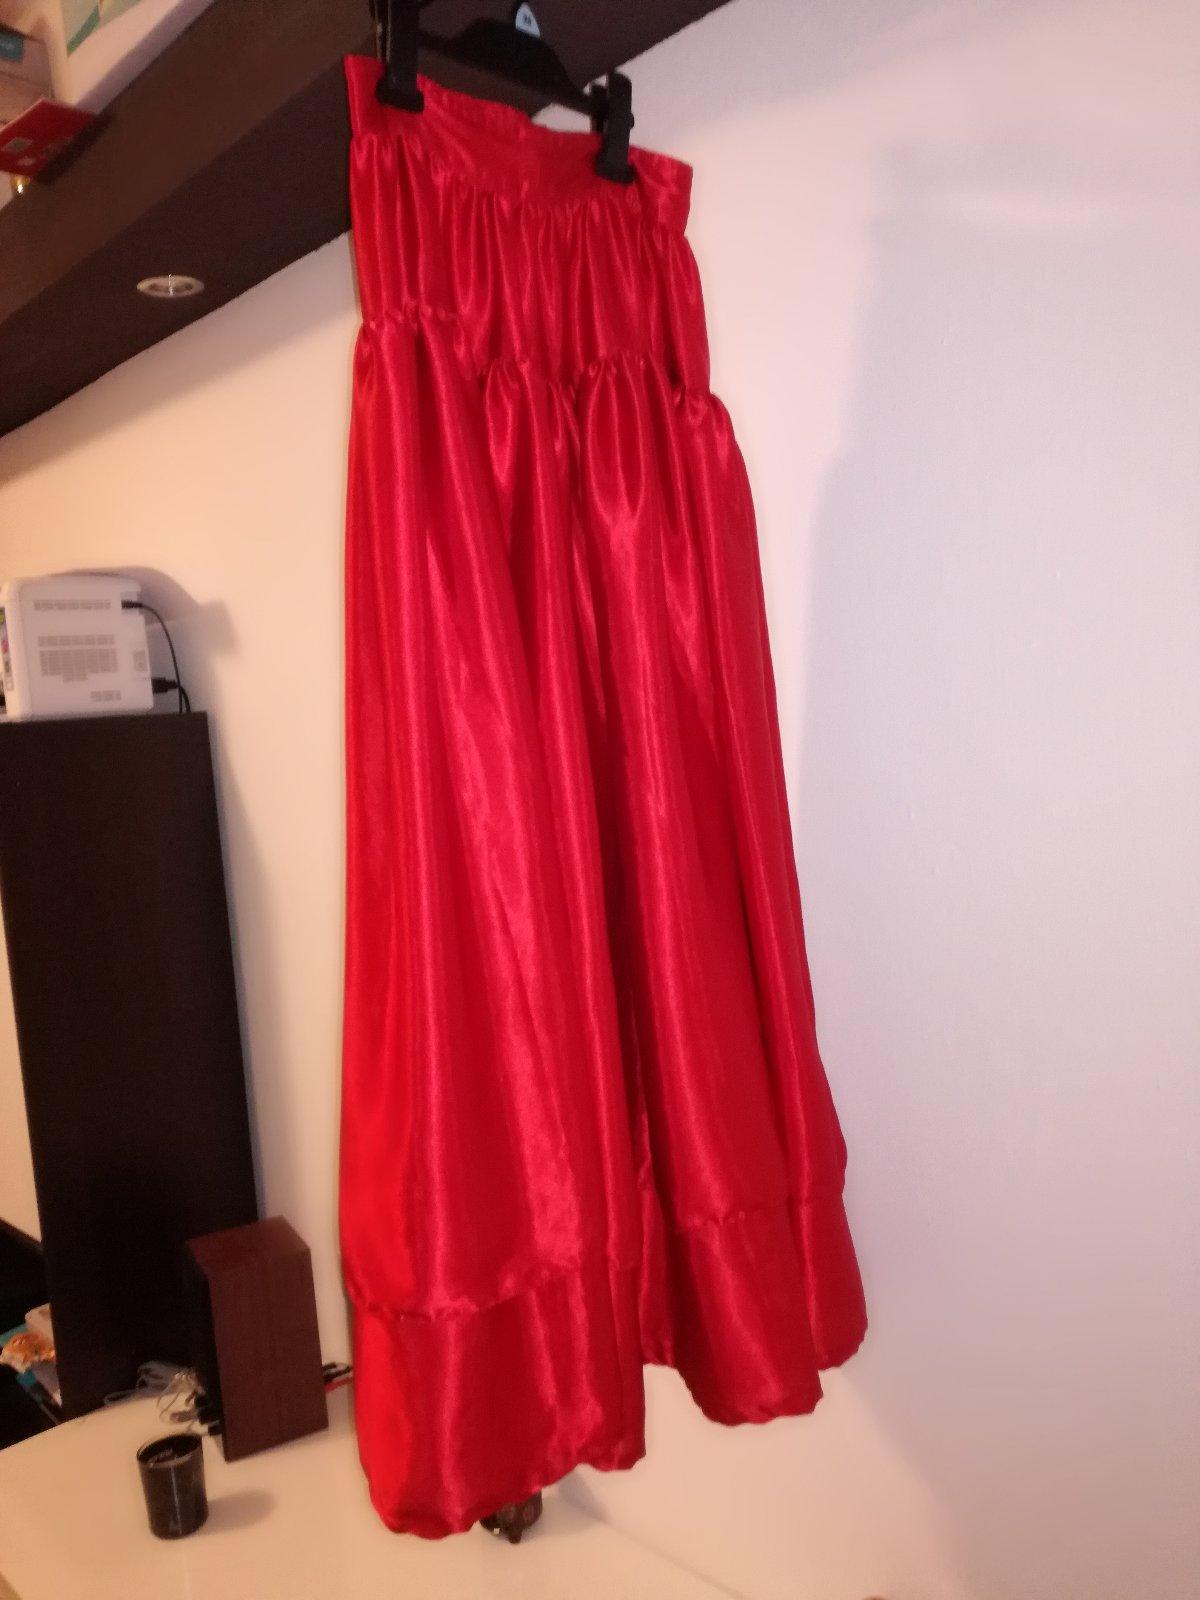 55870ee4c11f Saténová dlhá červená maxi sukňa